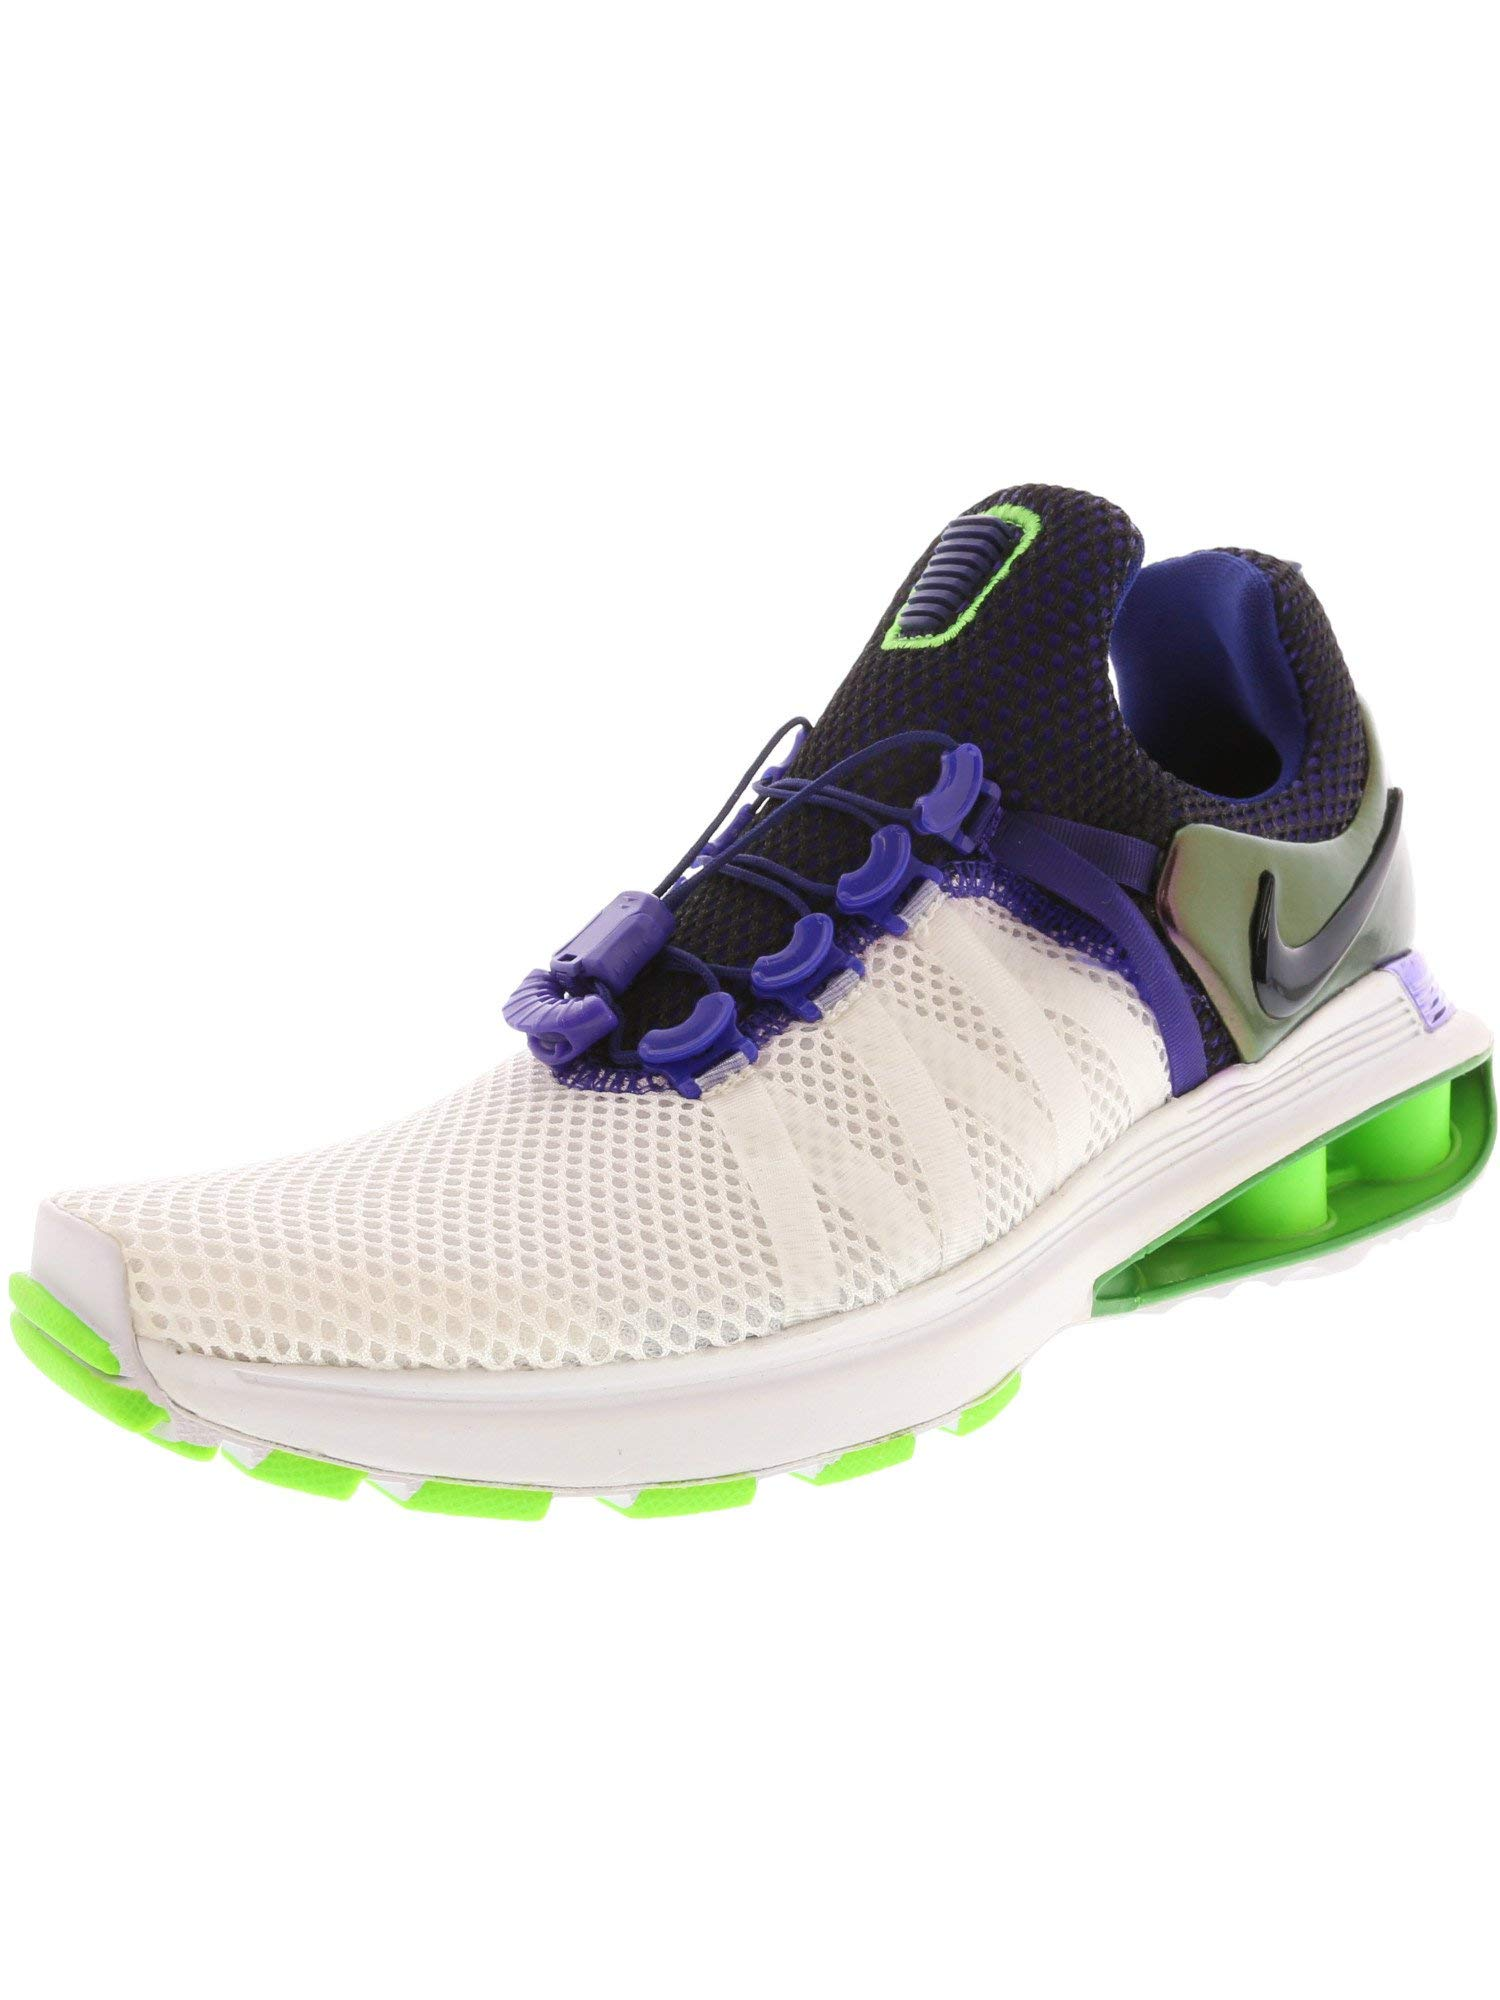 NIKE Women's Shox Gravity Running Shoes-White/Fusion Violet-6.5